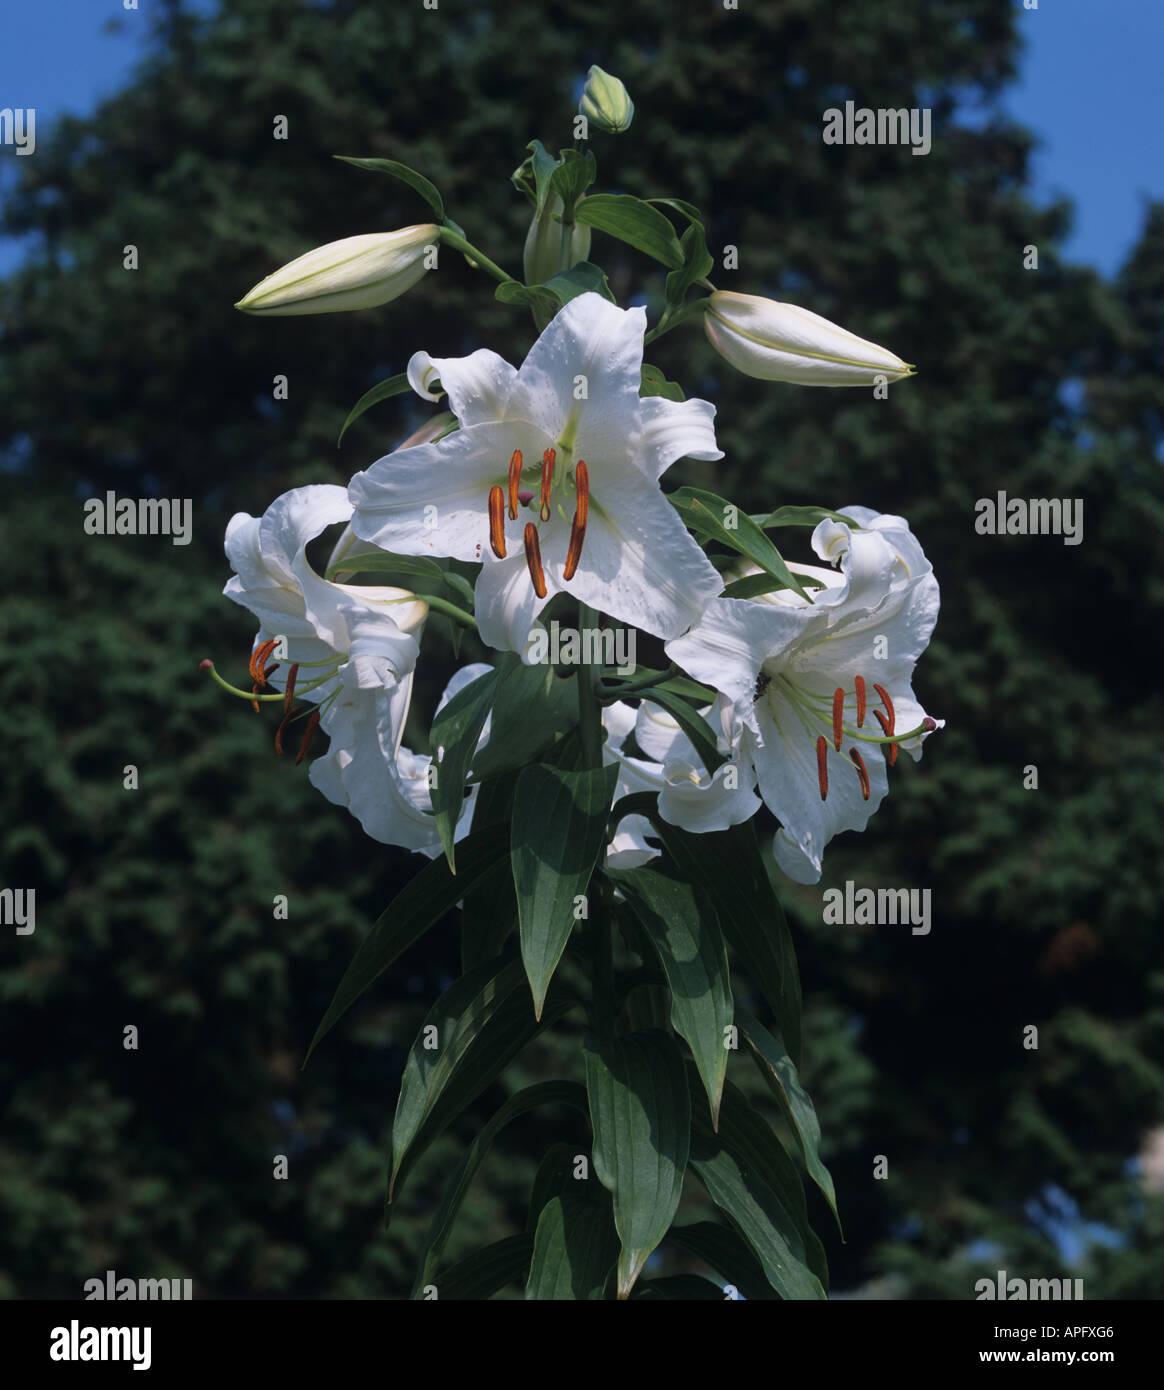 Regal lily Lilium regale in full flower - Stock Image